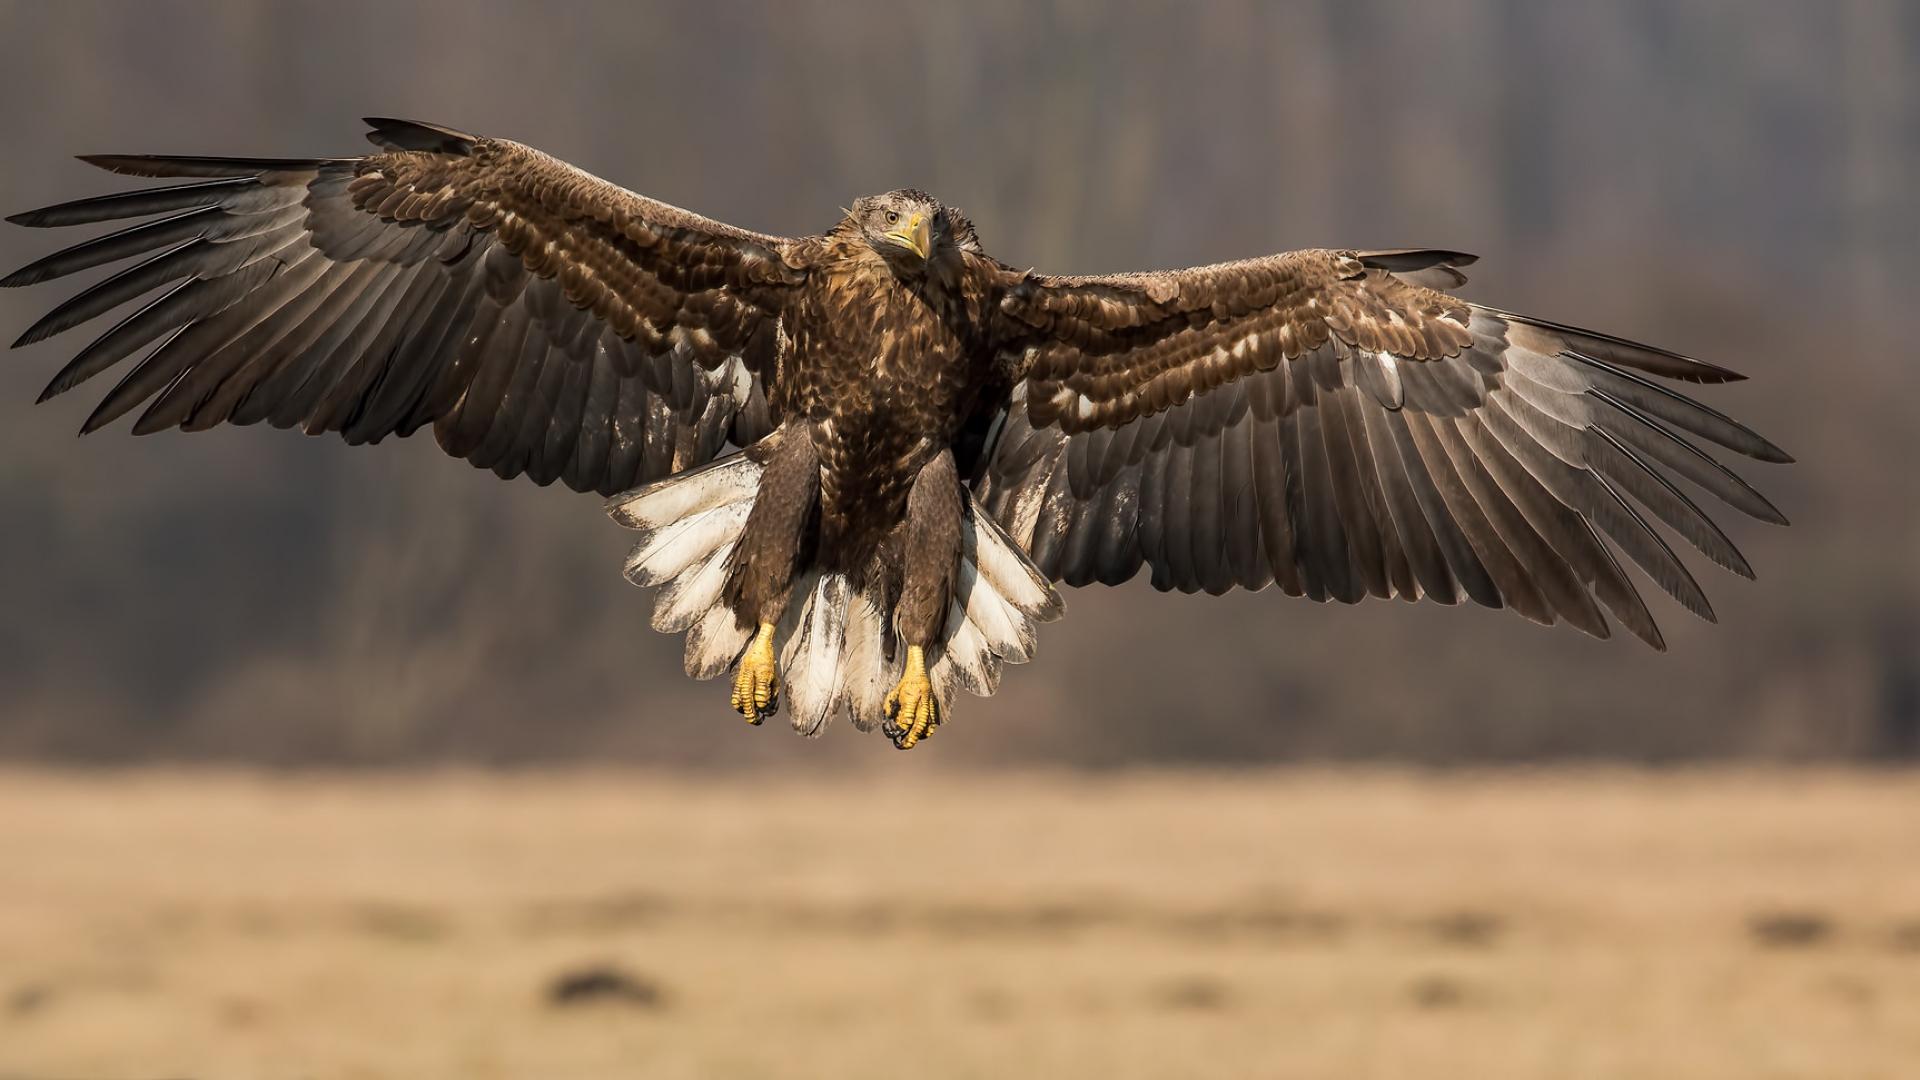 Un águila con las alas extendidas - 1920x1080